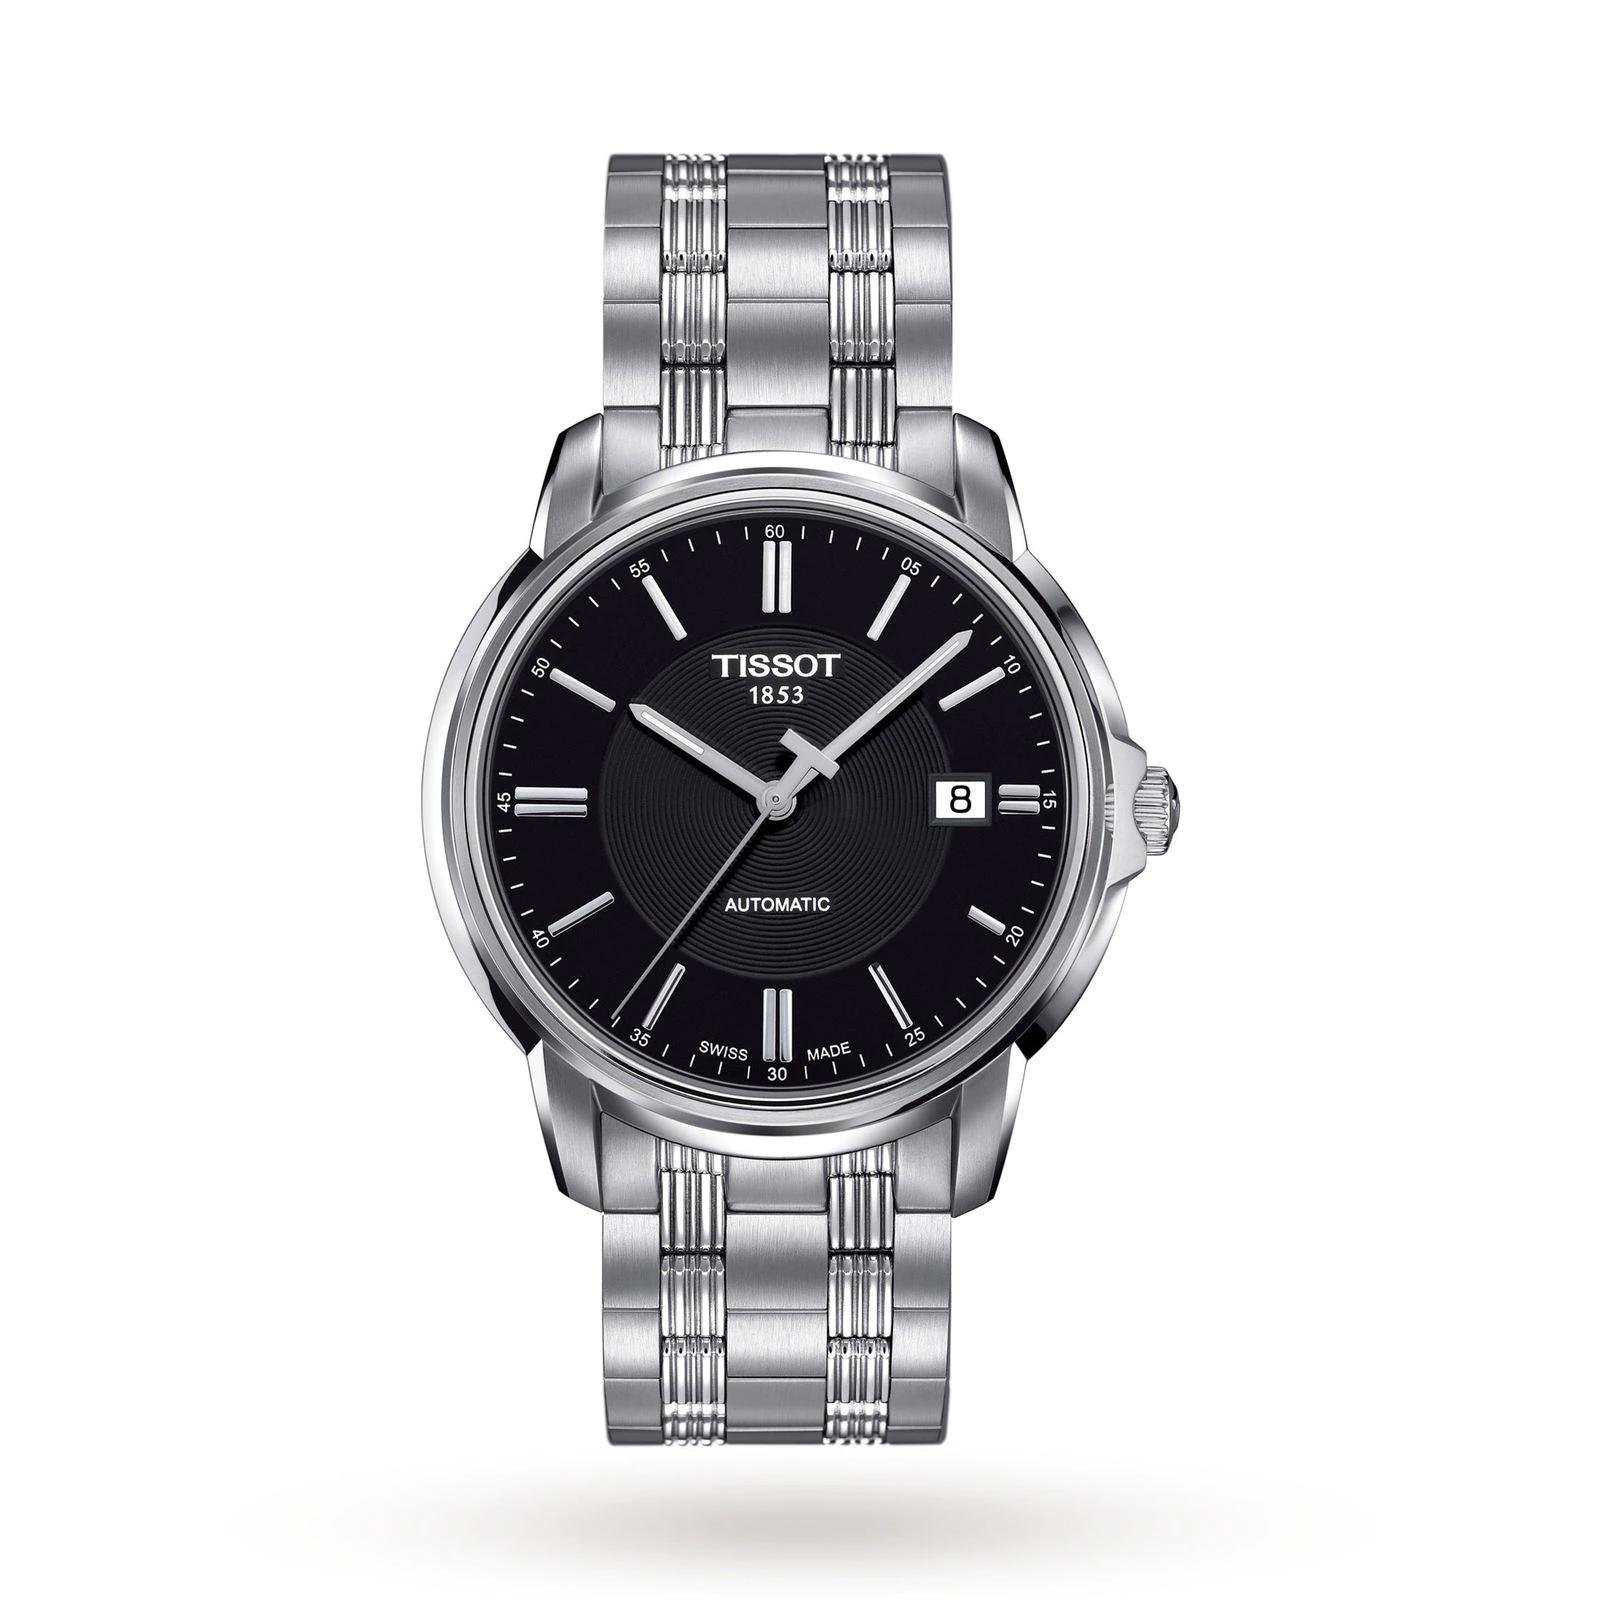 Tissot T-Classic Automatics III Automatic 39mm Men's Watch - £270 @ Watches of Switzerland